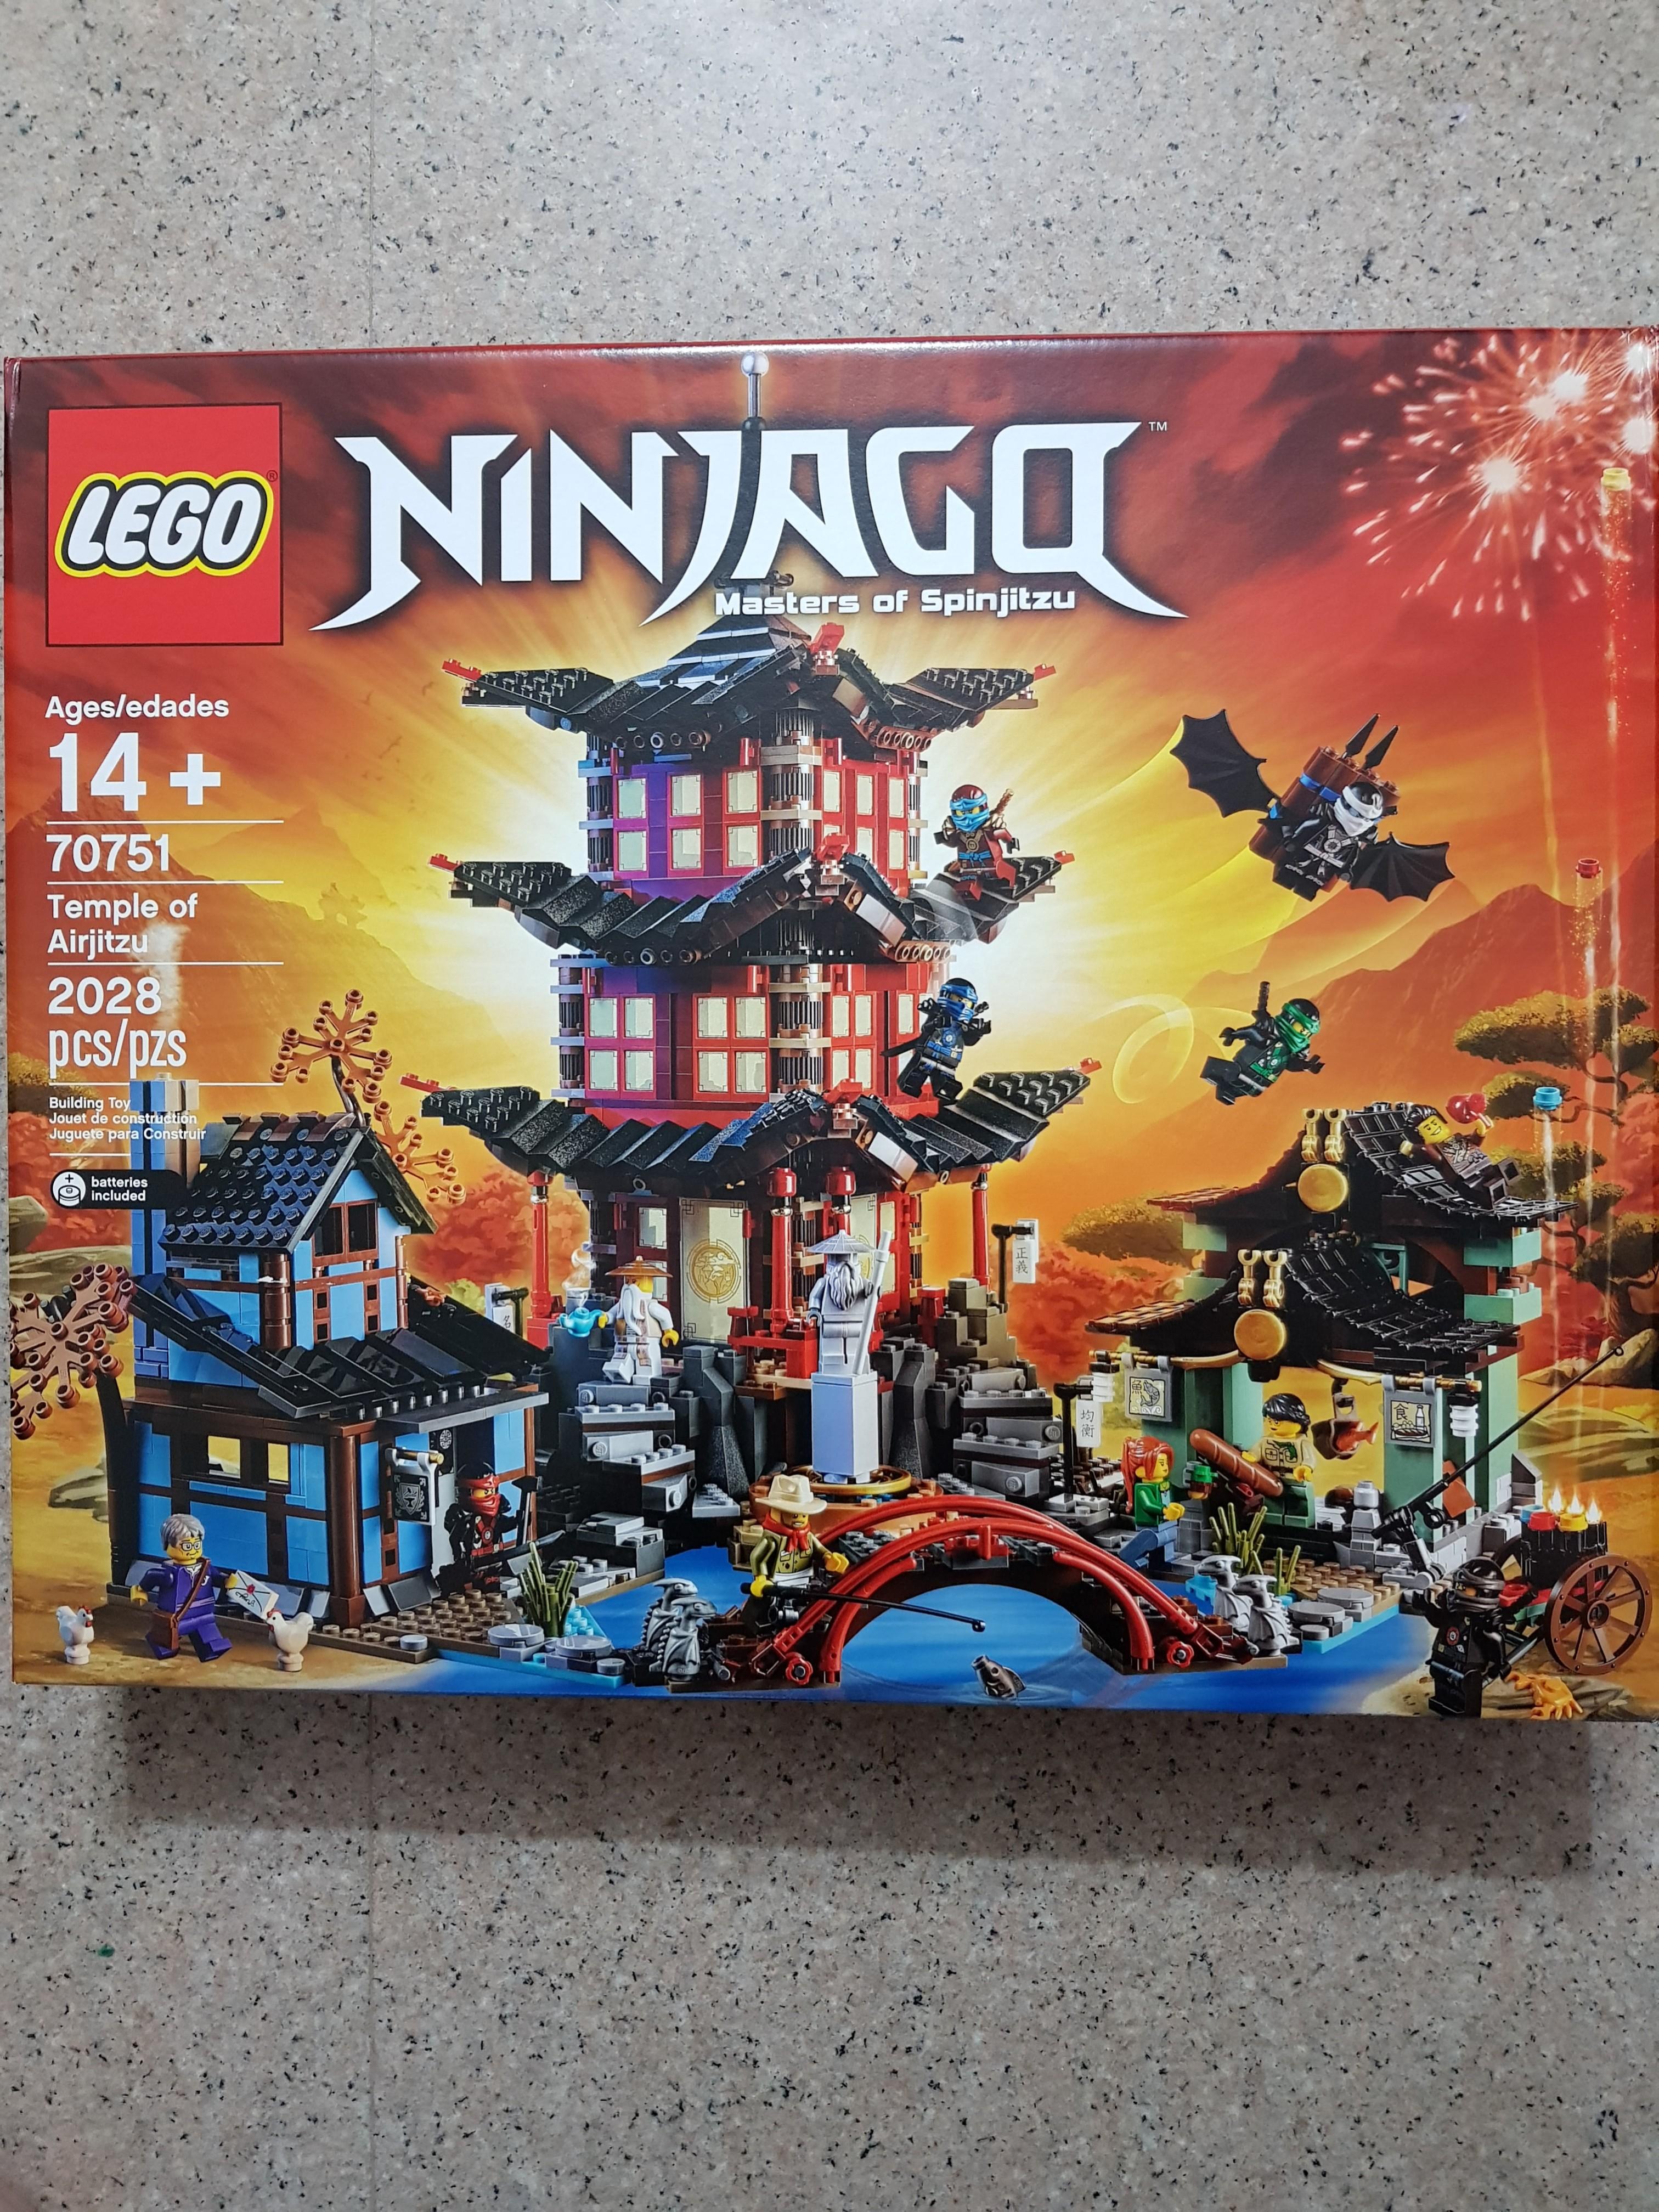 2507 70751 Ultimate 70657 70728 Ninja Of Airjitzu Docks 70505 Movie 70620 Weapon Light Misb City Resurrection 70643 Temple Fire 70617 Lego Ninjago POX0wk8n